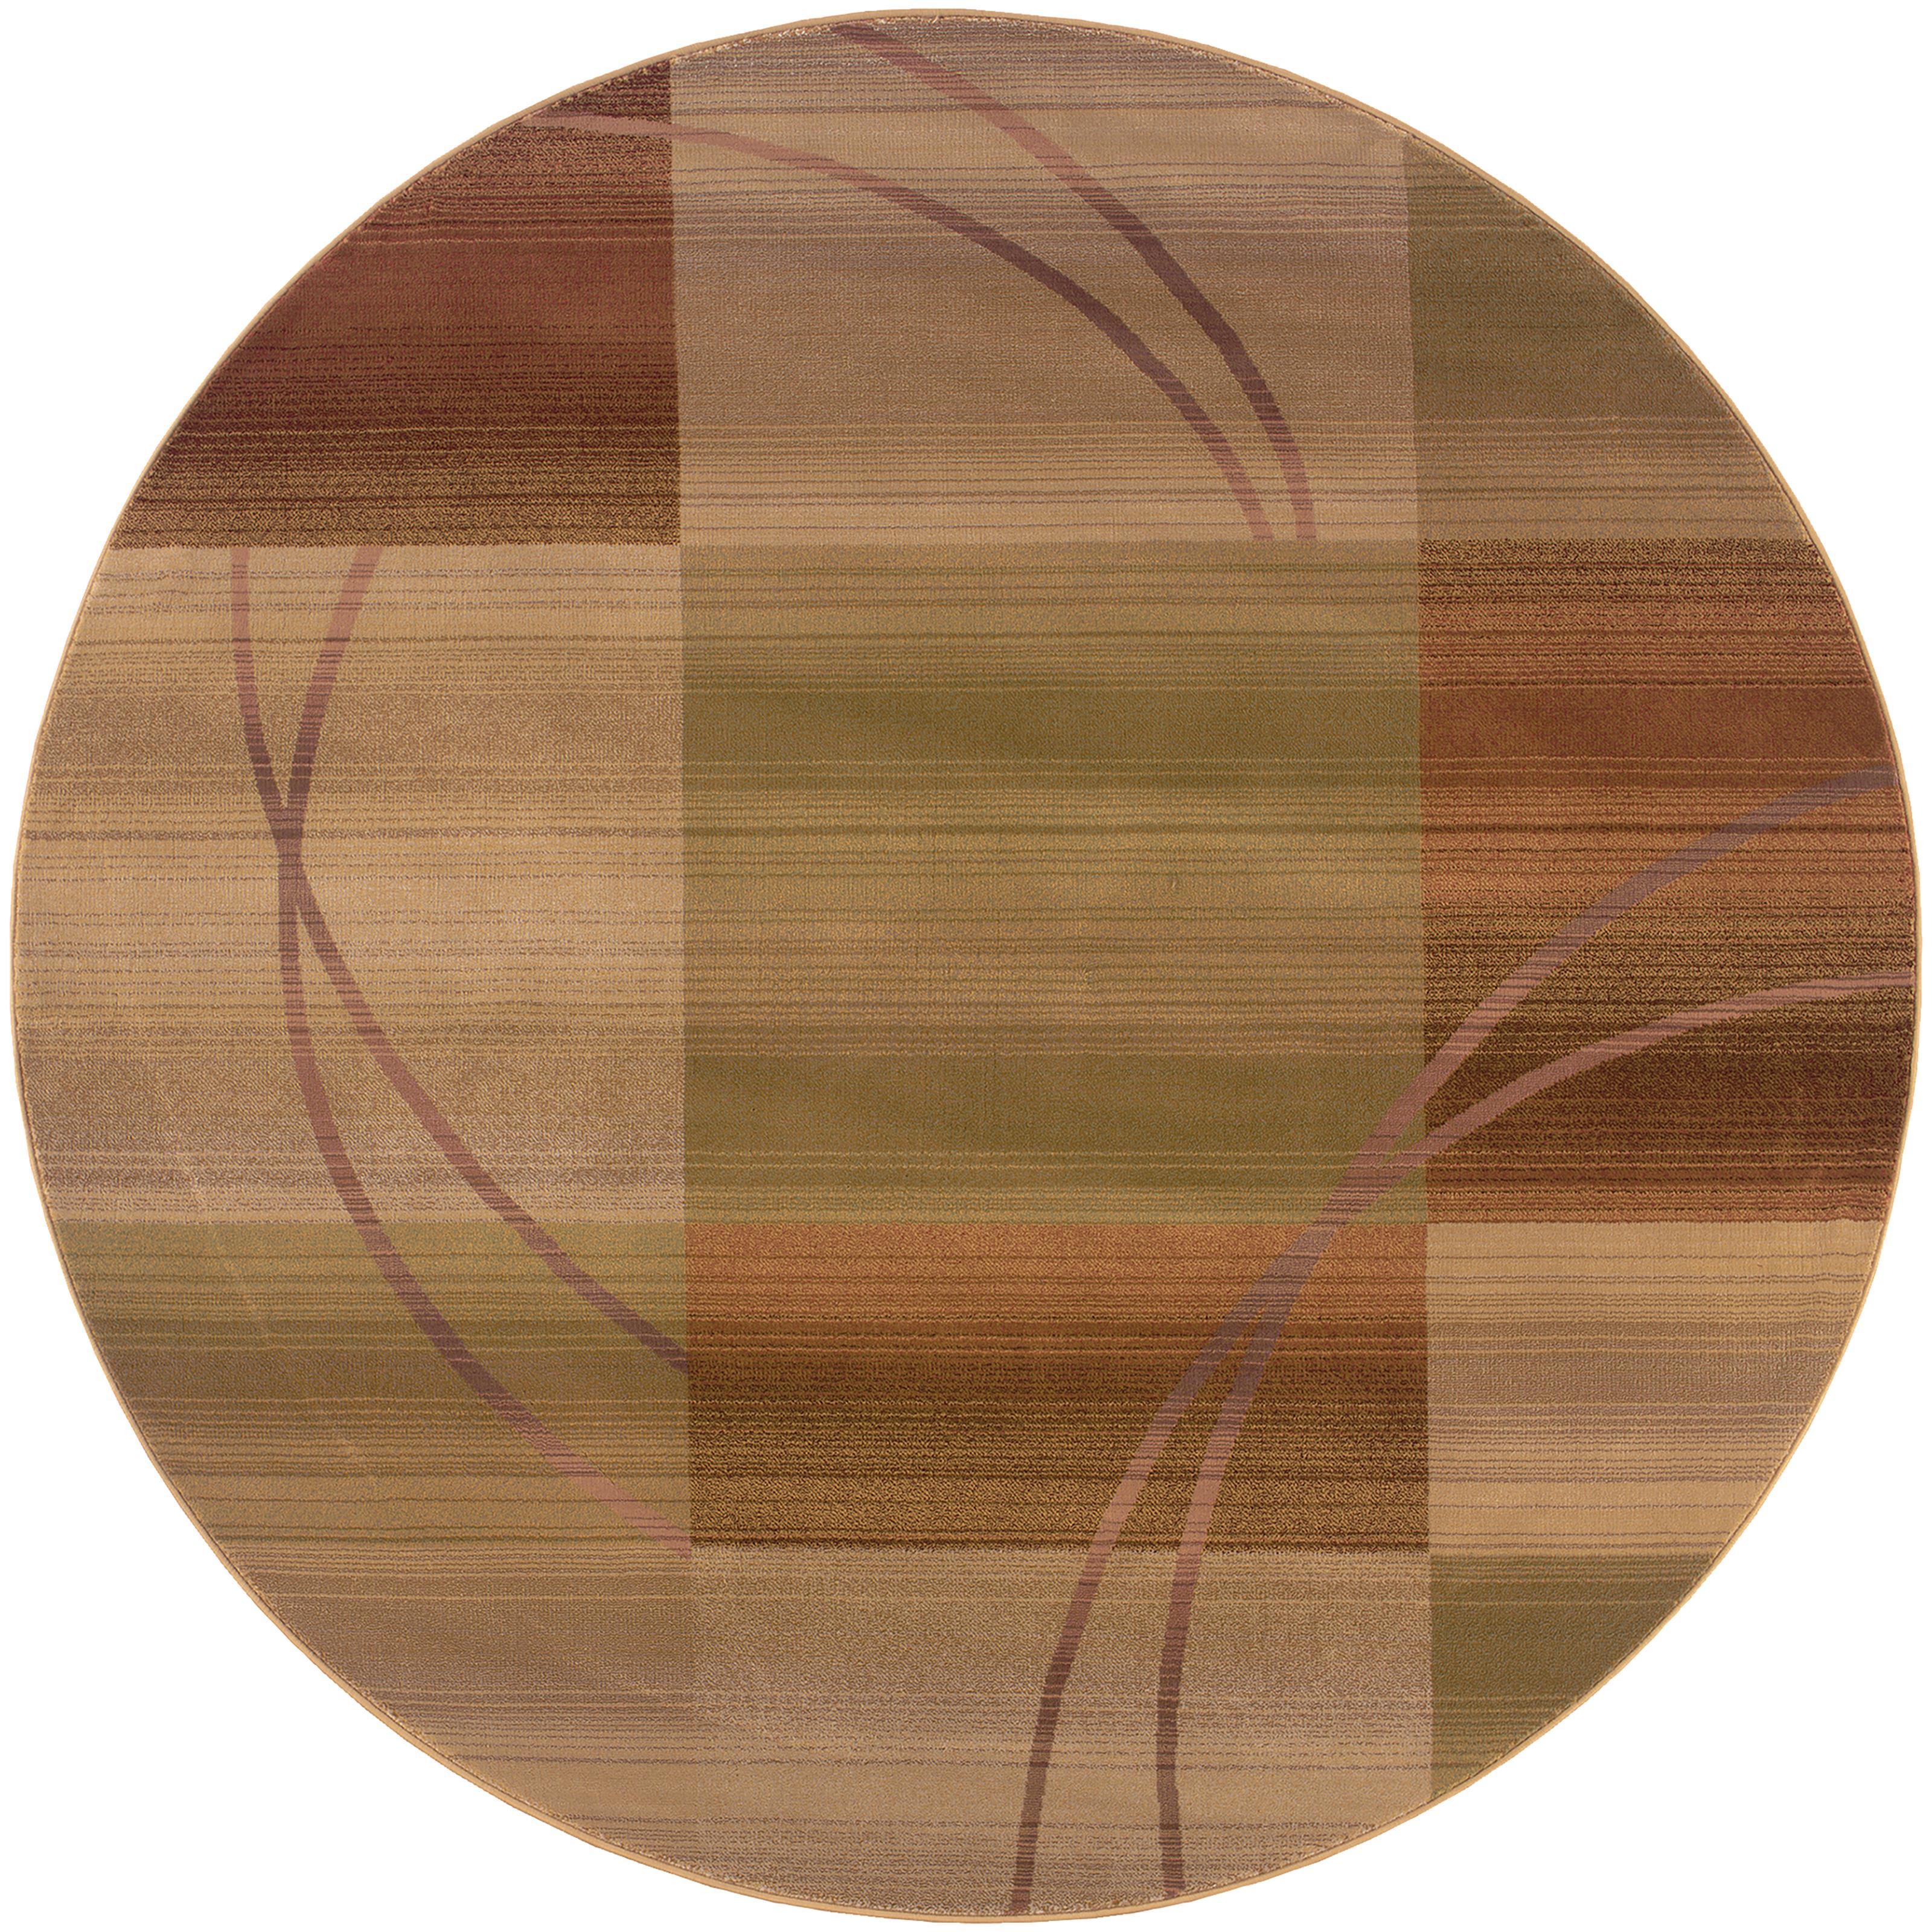 Oriental Weavers Generations 6' Rug - Item Number: G1608D180180ST